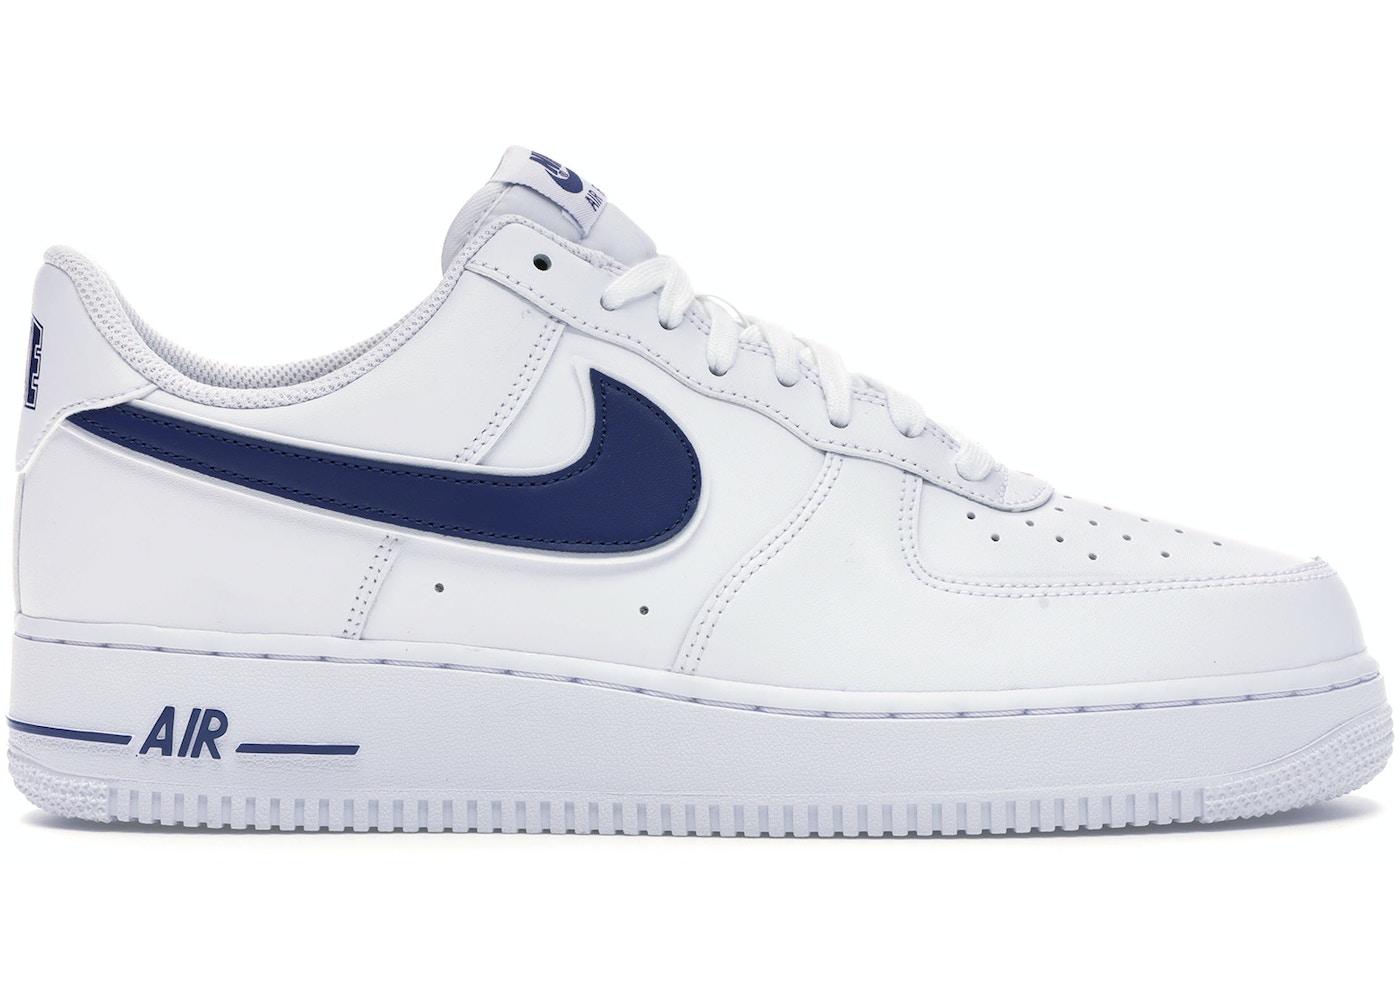 Nike Air Force 1 Low White Deep Royal Ao2423 103